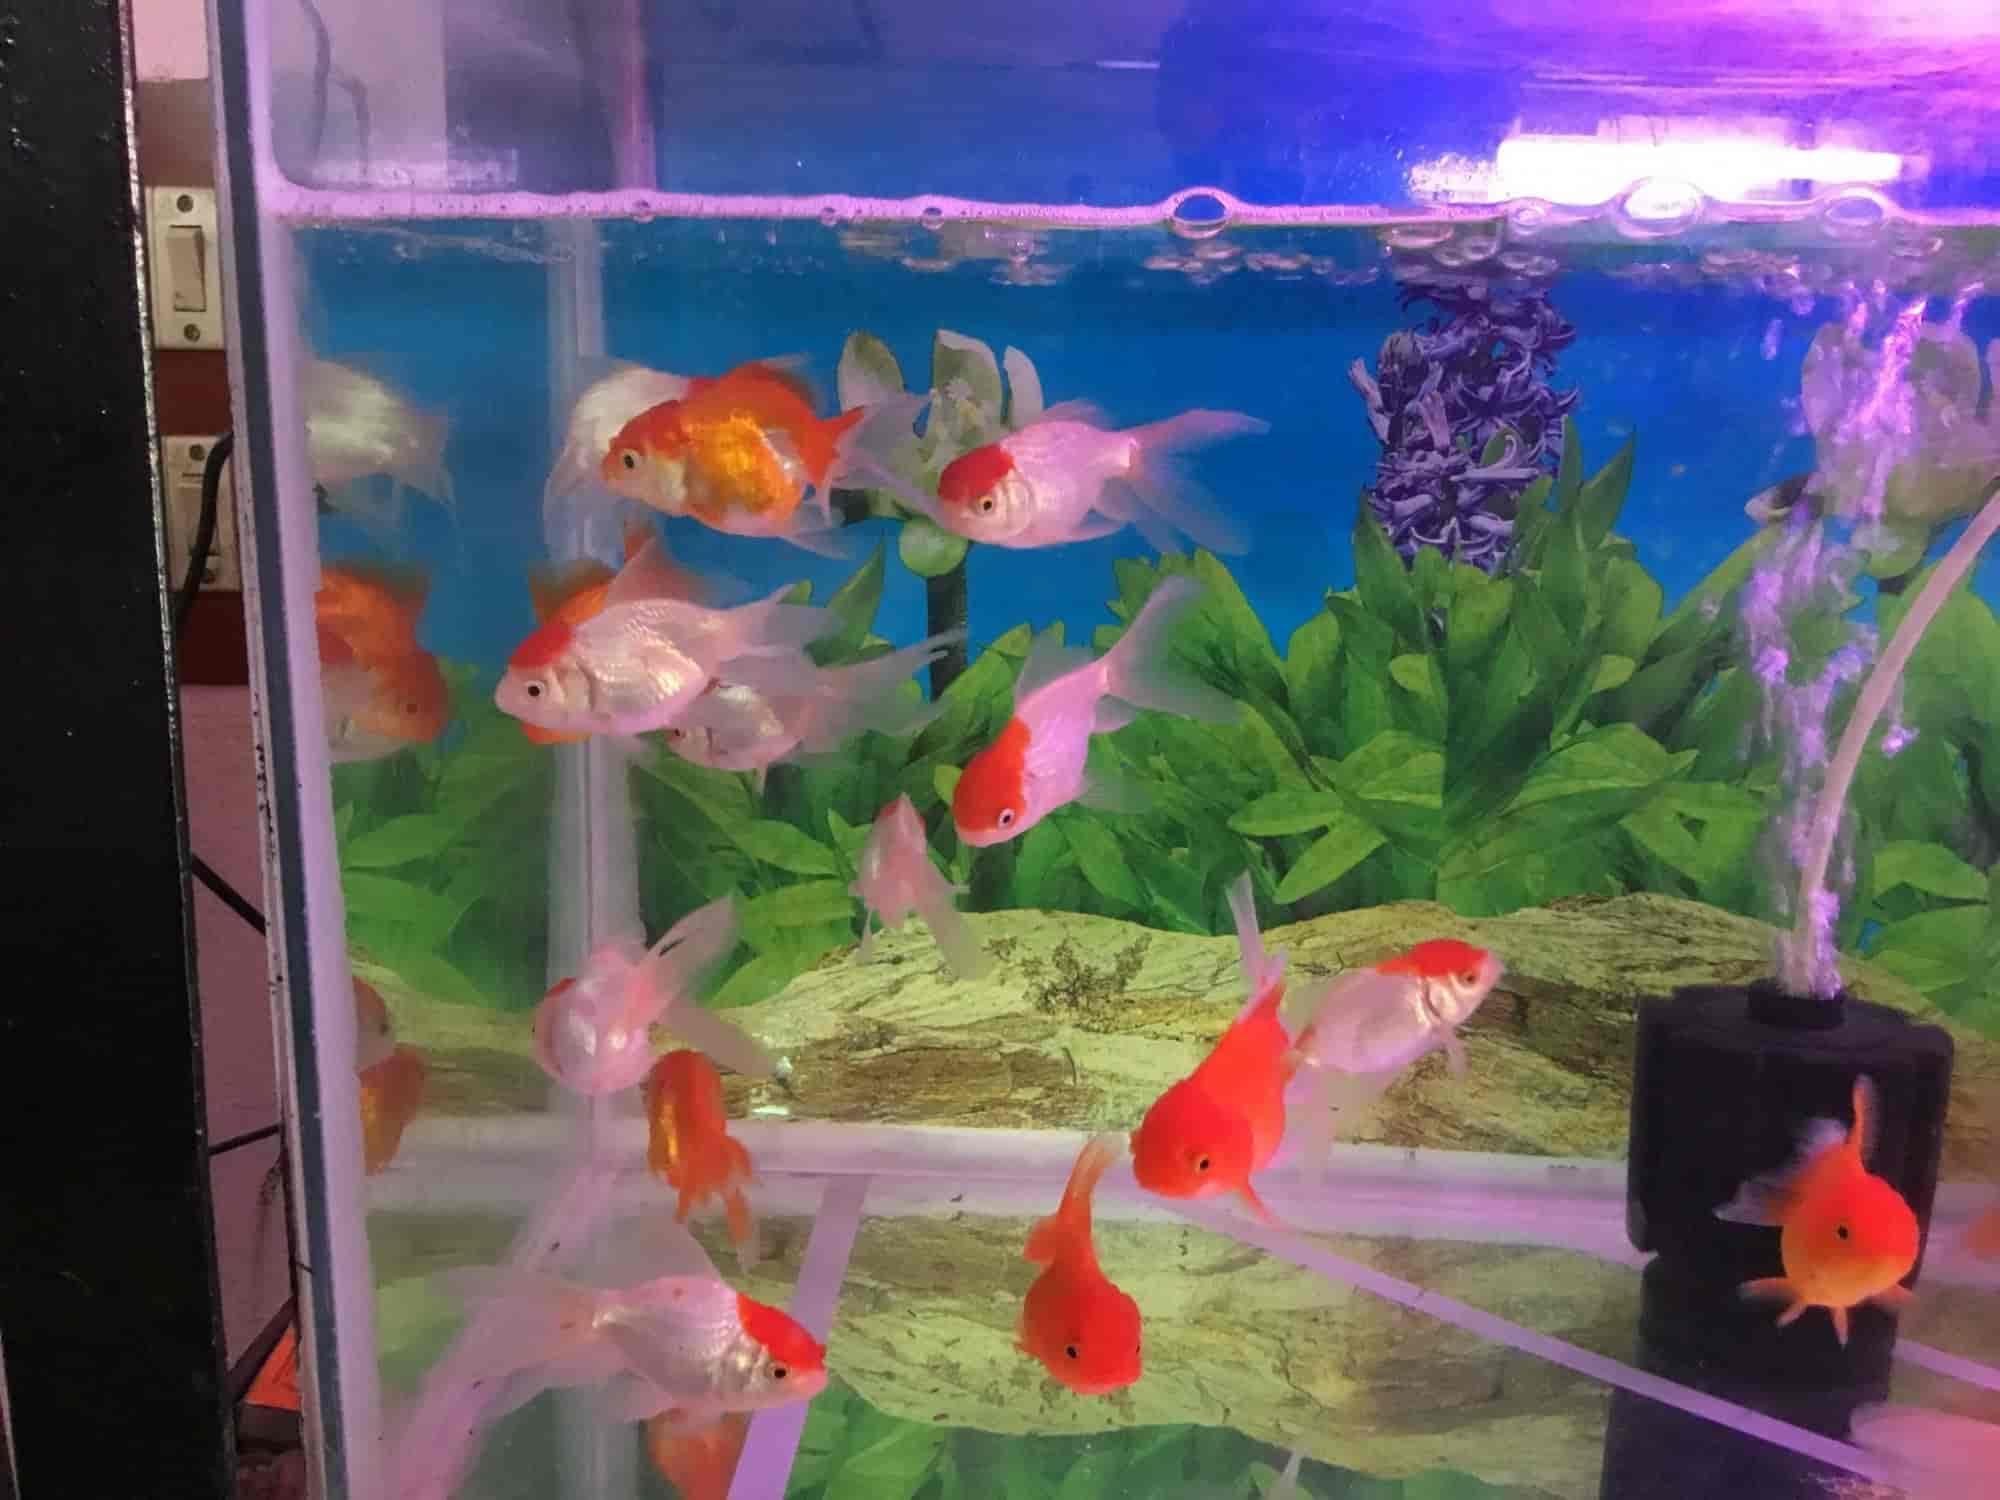 rainbow aquarium kolathur aquariums in chennai justdial